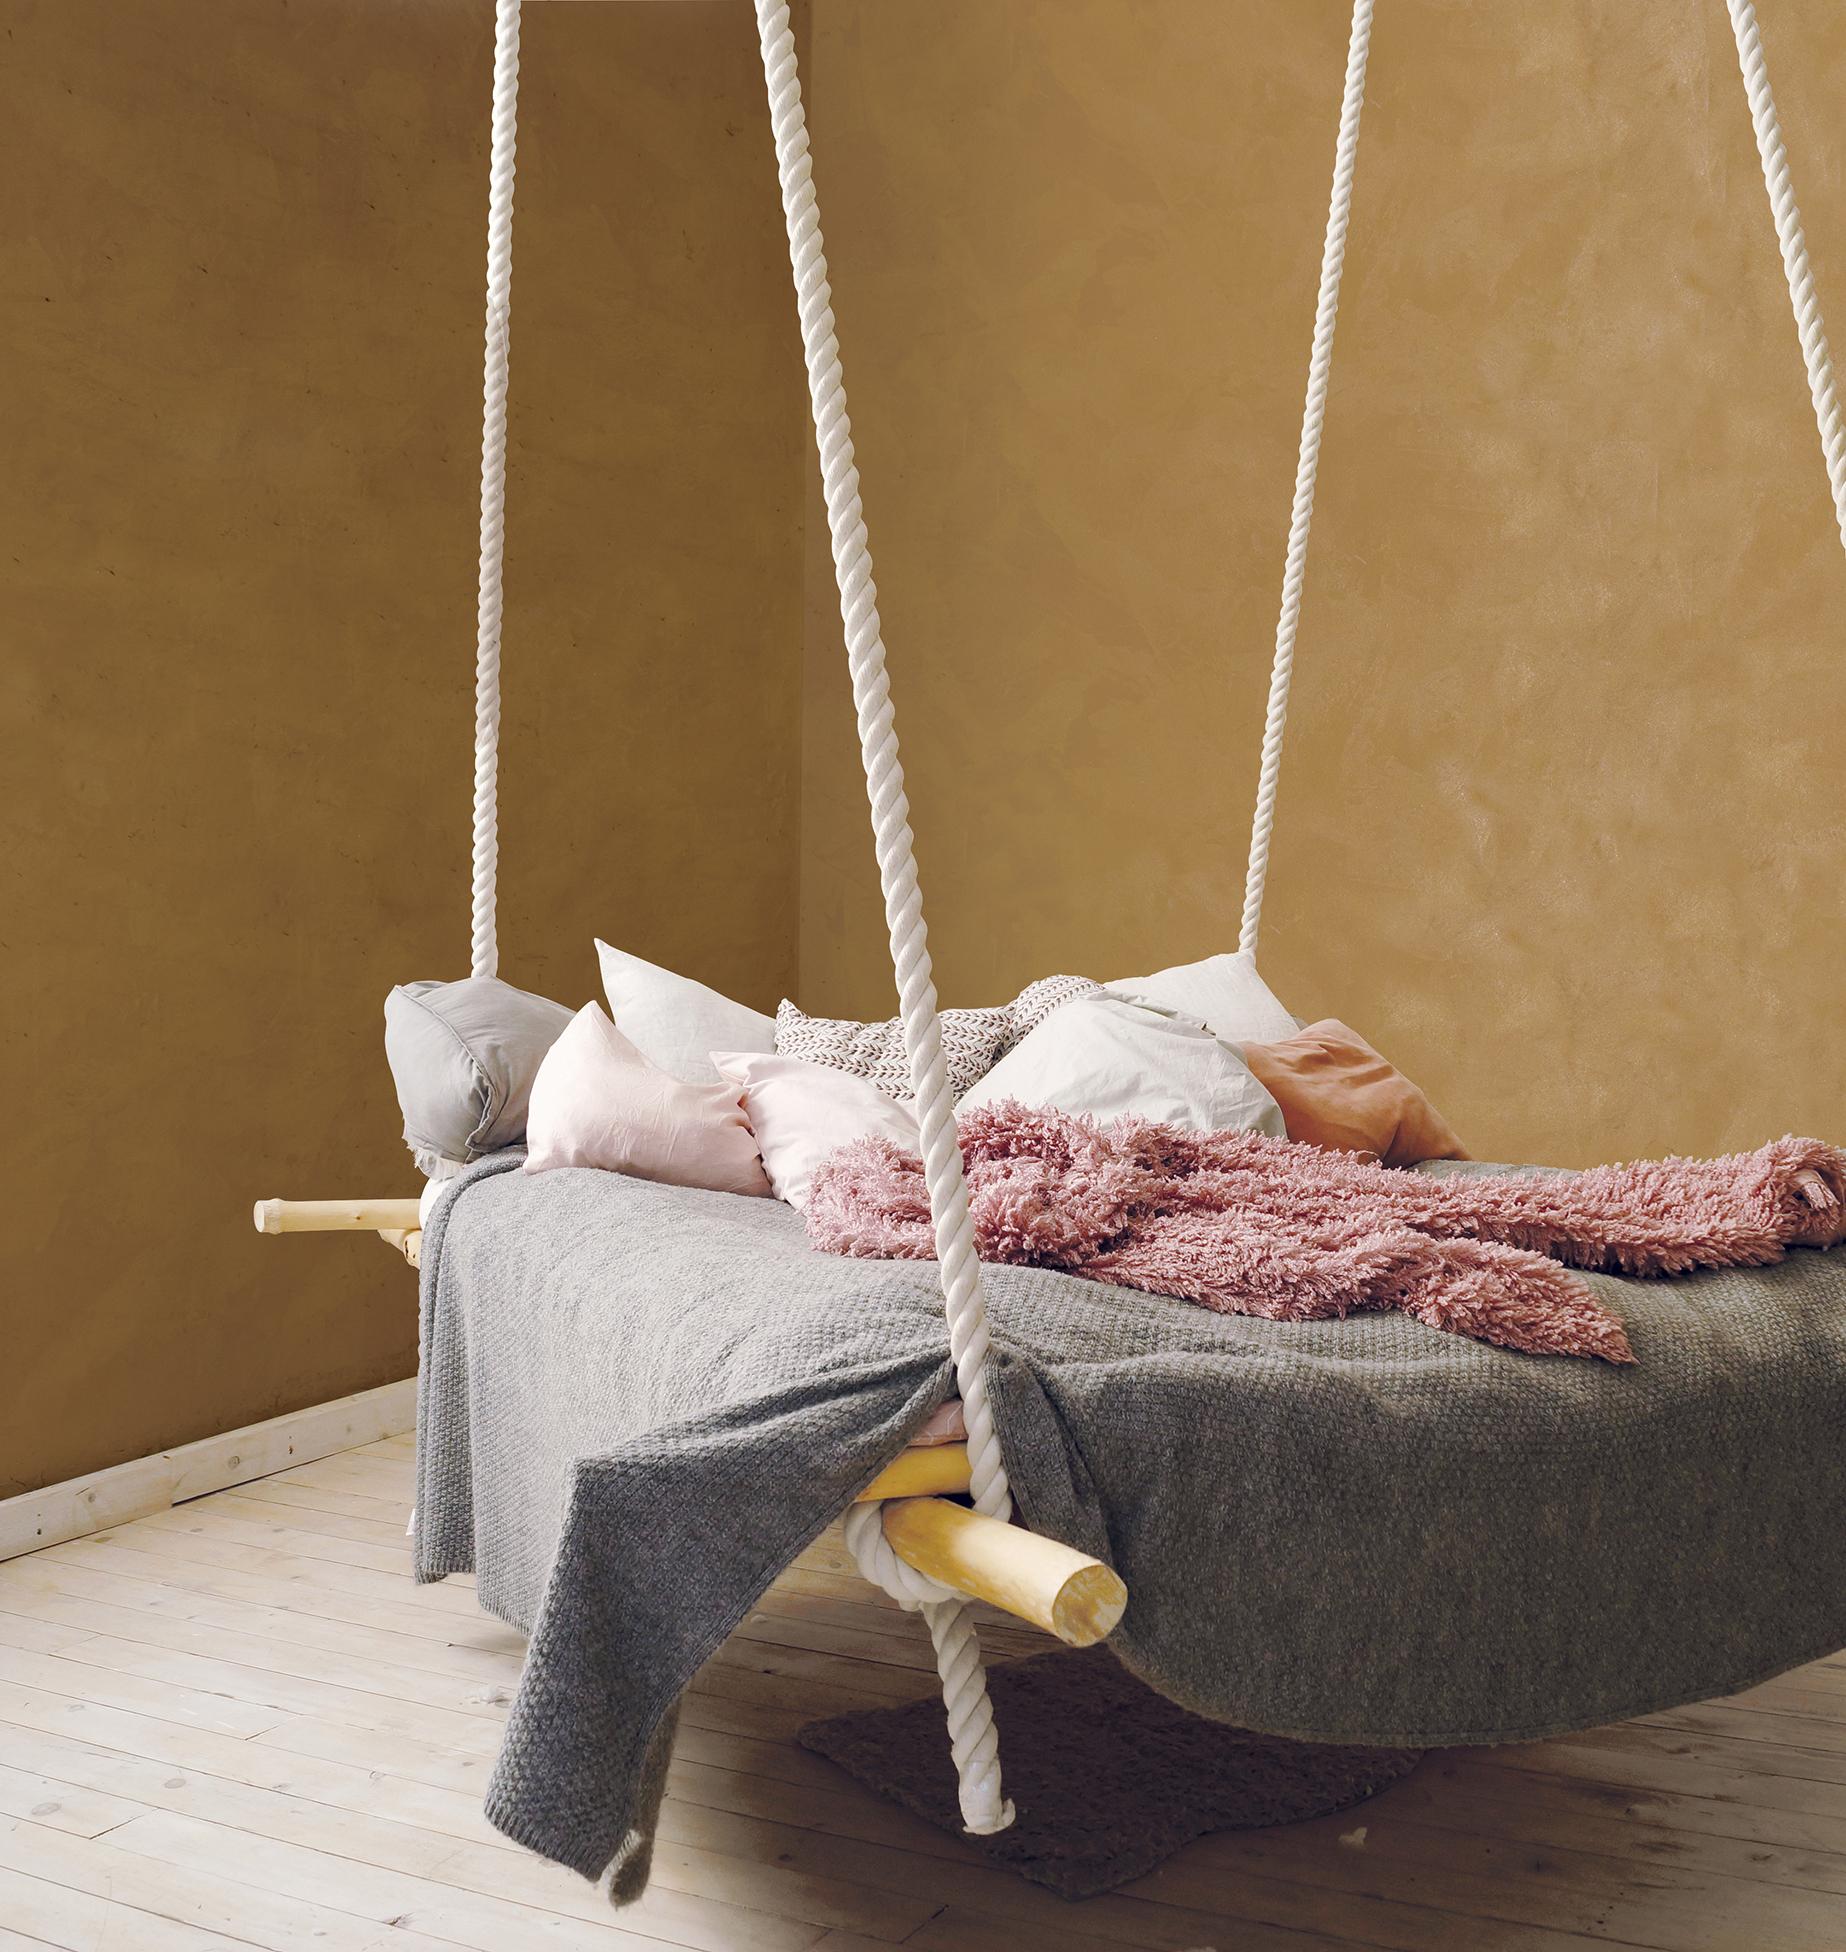 Hanging bed in rural or loft bedroom interior.